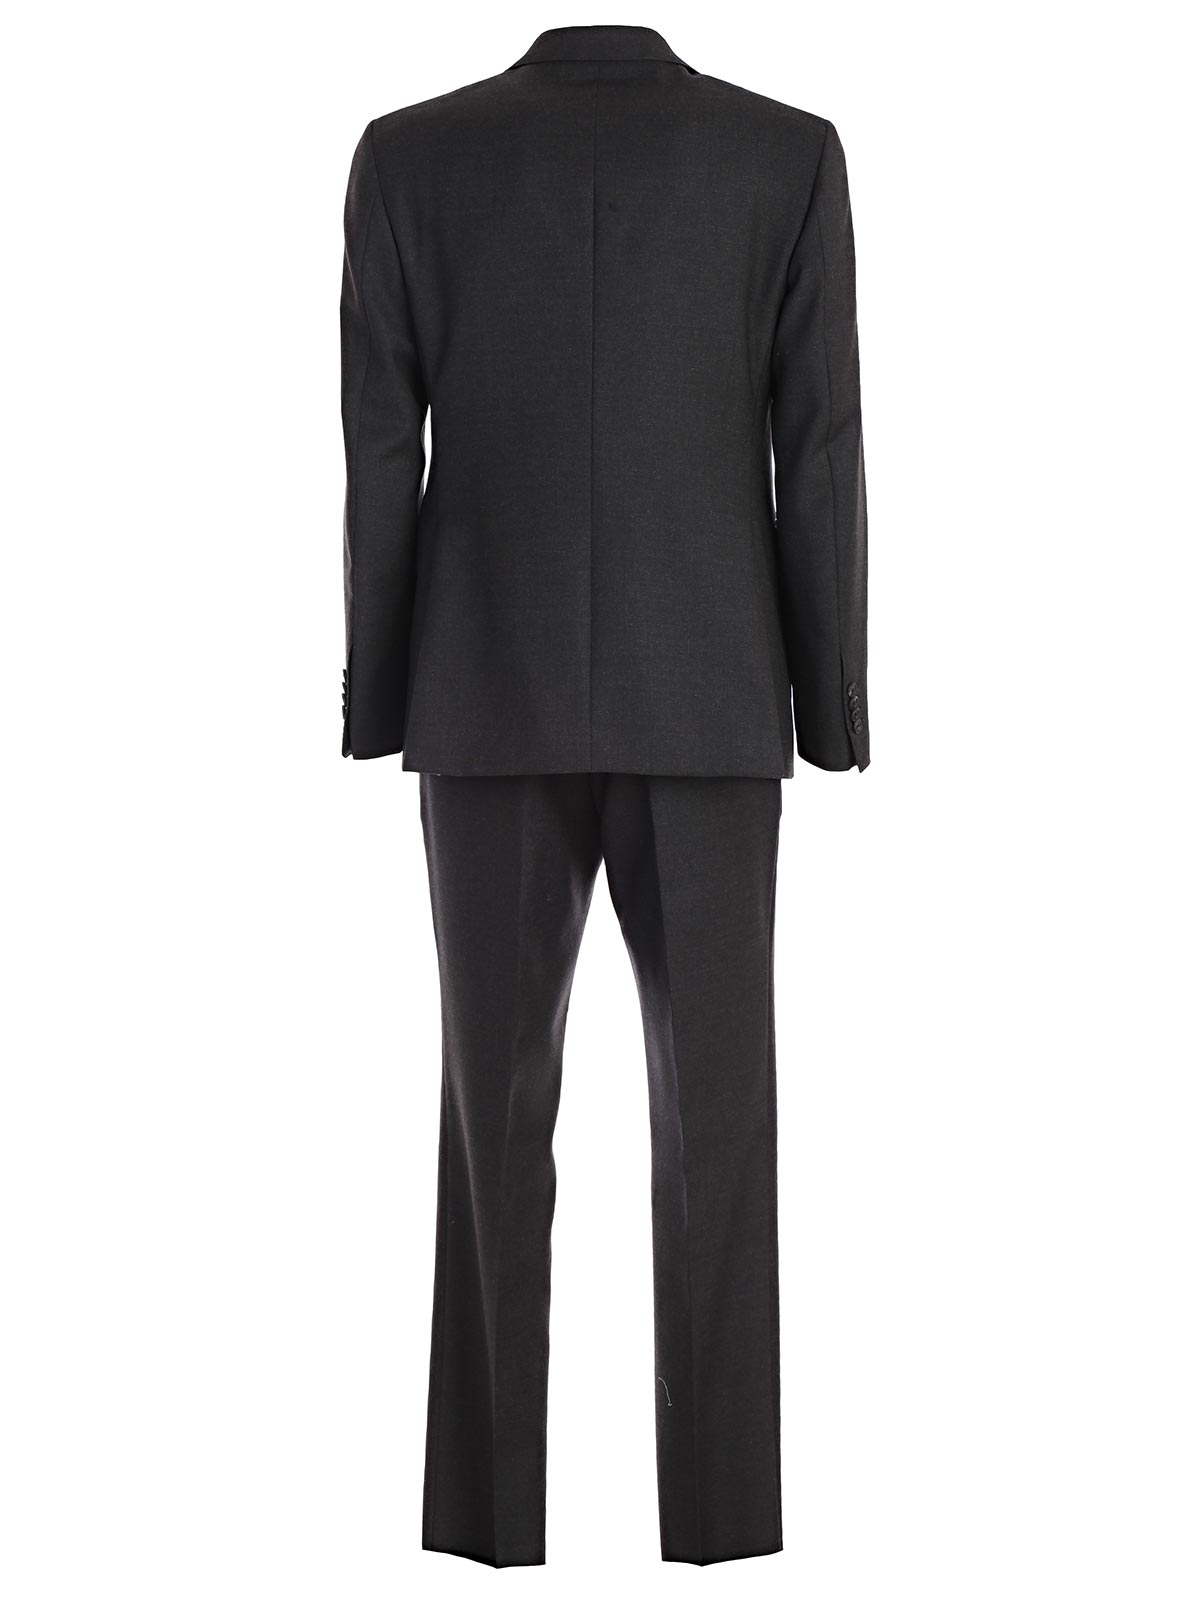 Picture of Tagliatore Suits